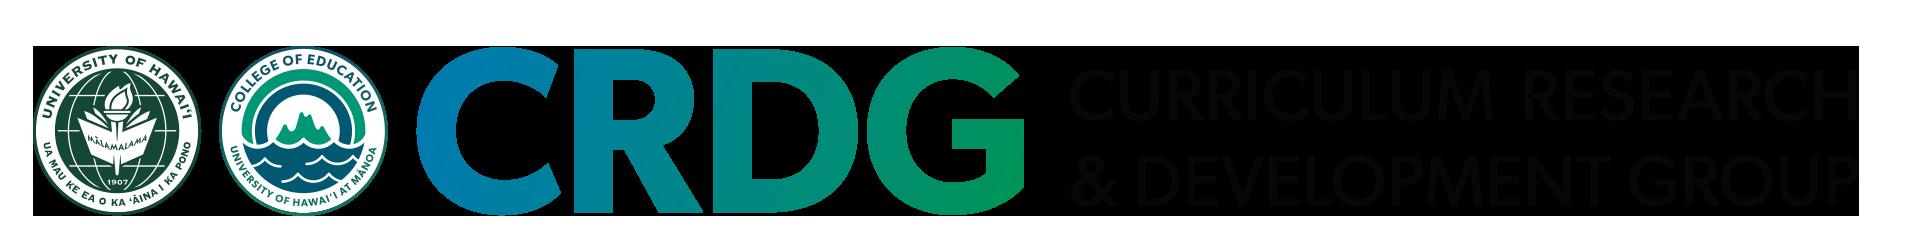 crdg logo graphic